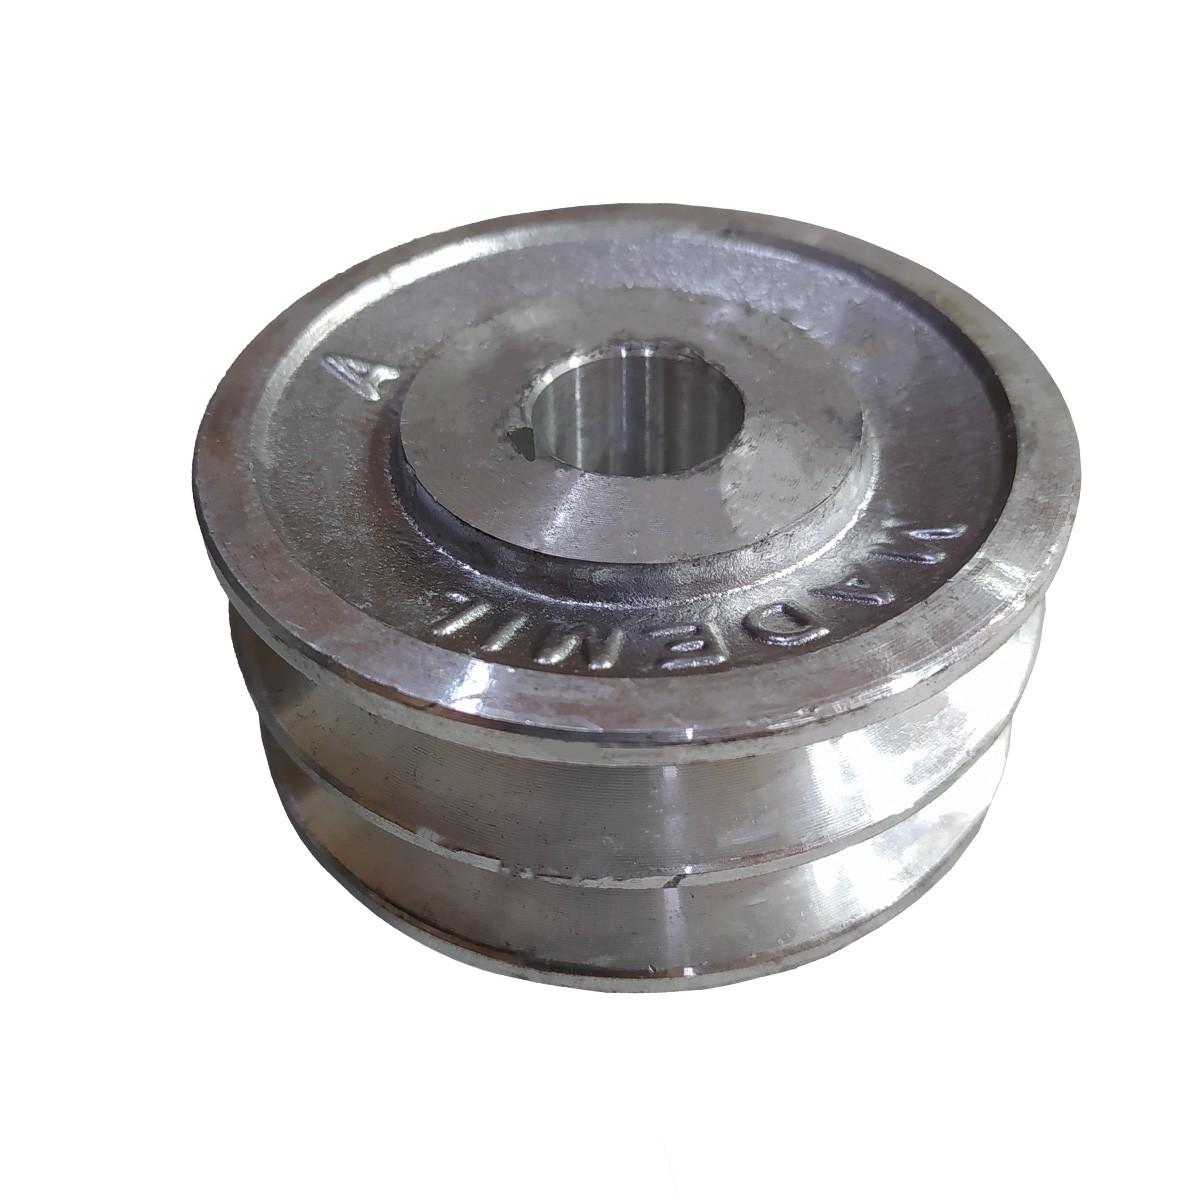 Polia De Aluminio 50mm Furo 19mm 2 Canal A Chaveta